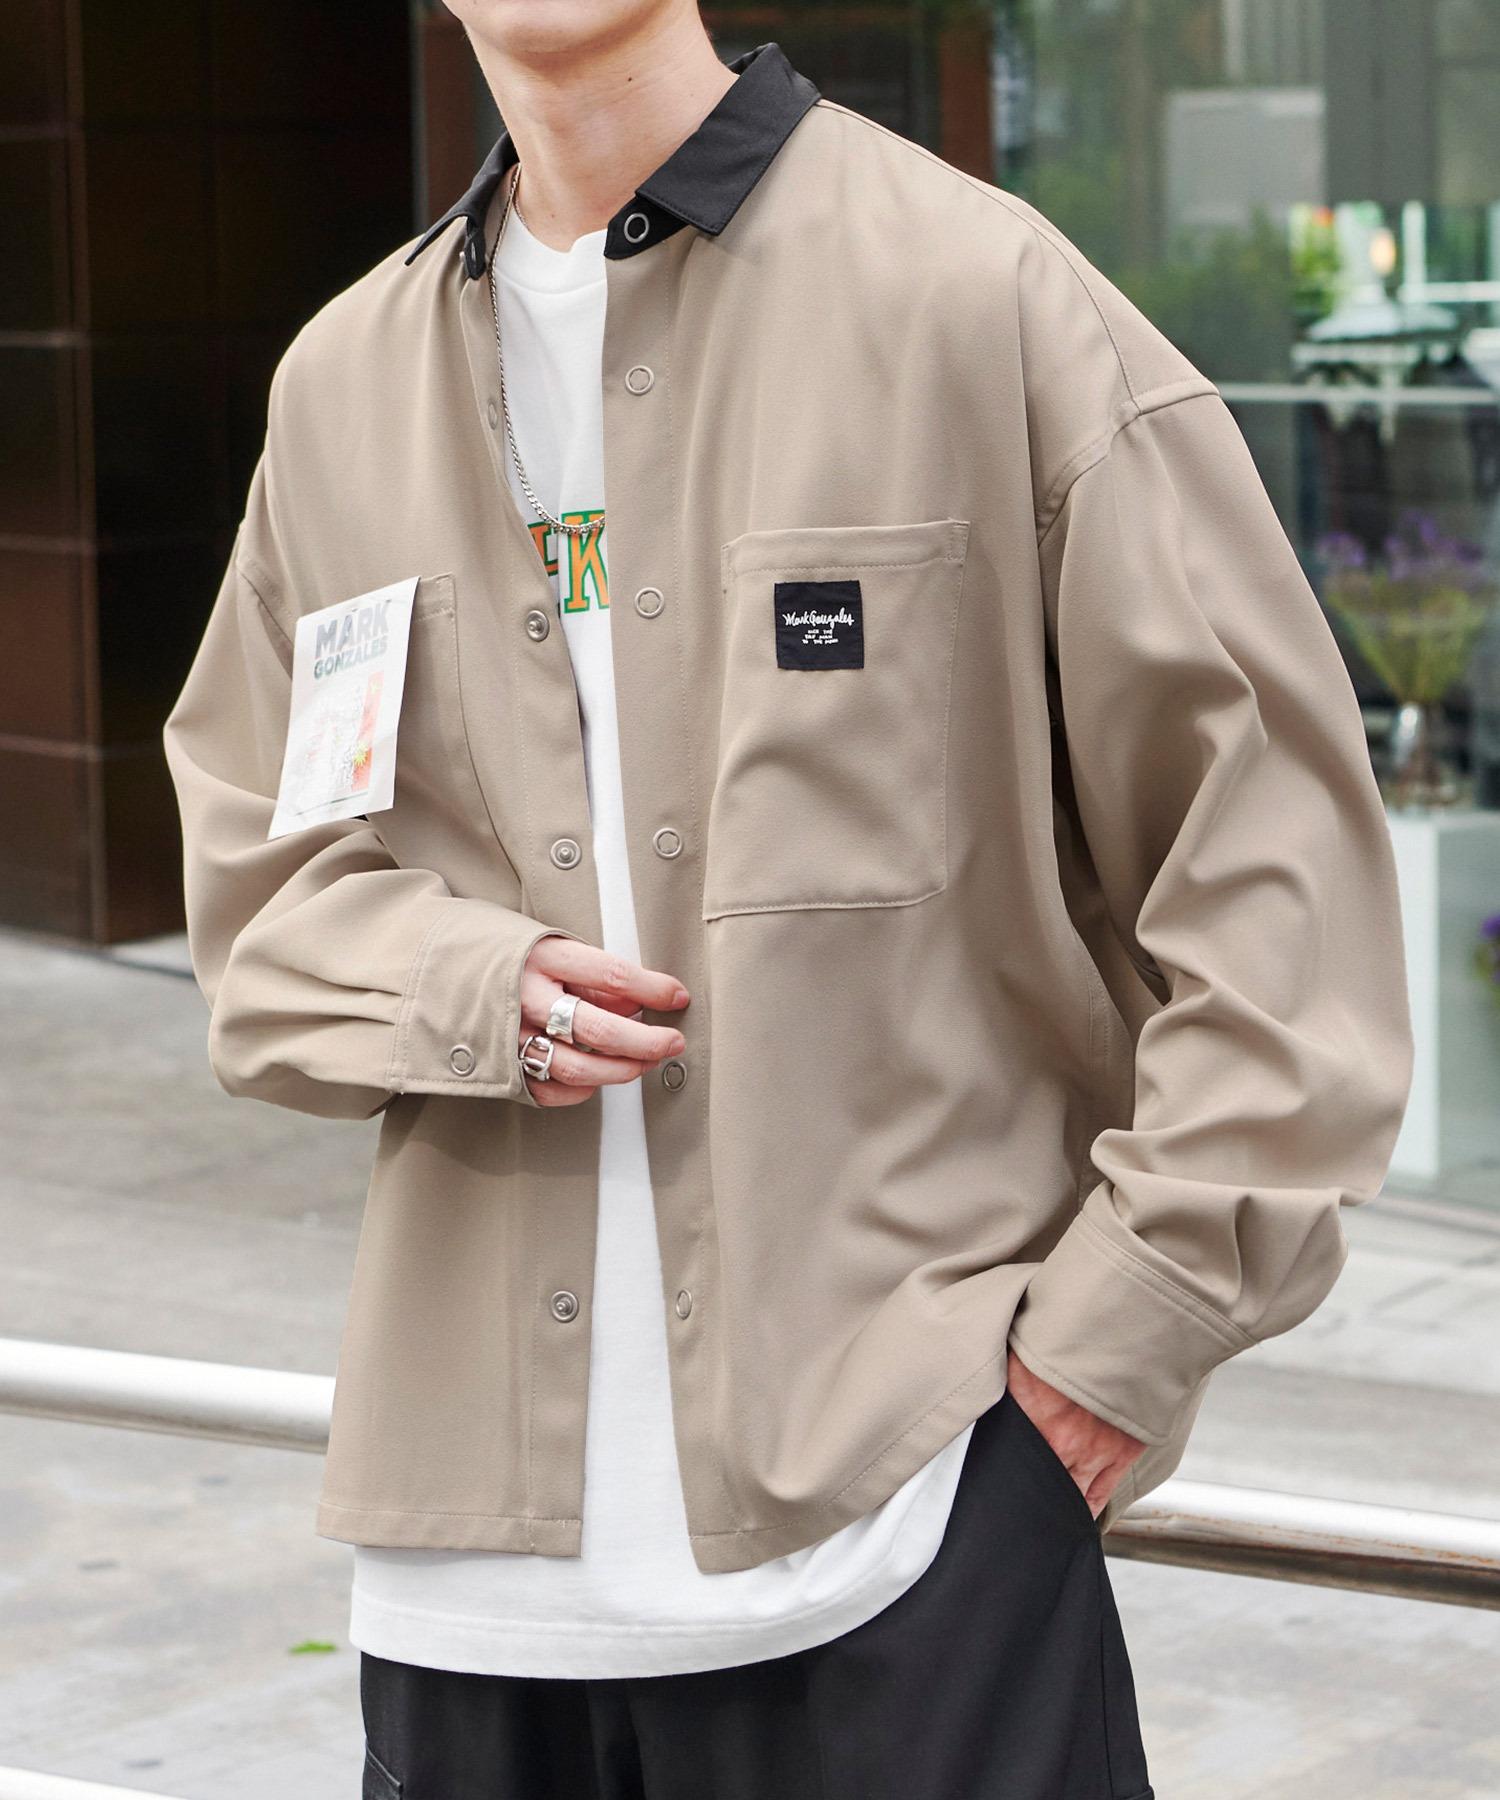 Mark Gonzales/マークゴンザレス MONO-MART別注 オーバーサイズ クレリック ピスネーム長袖ワークシャツ